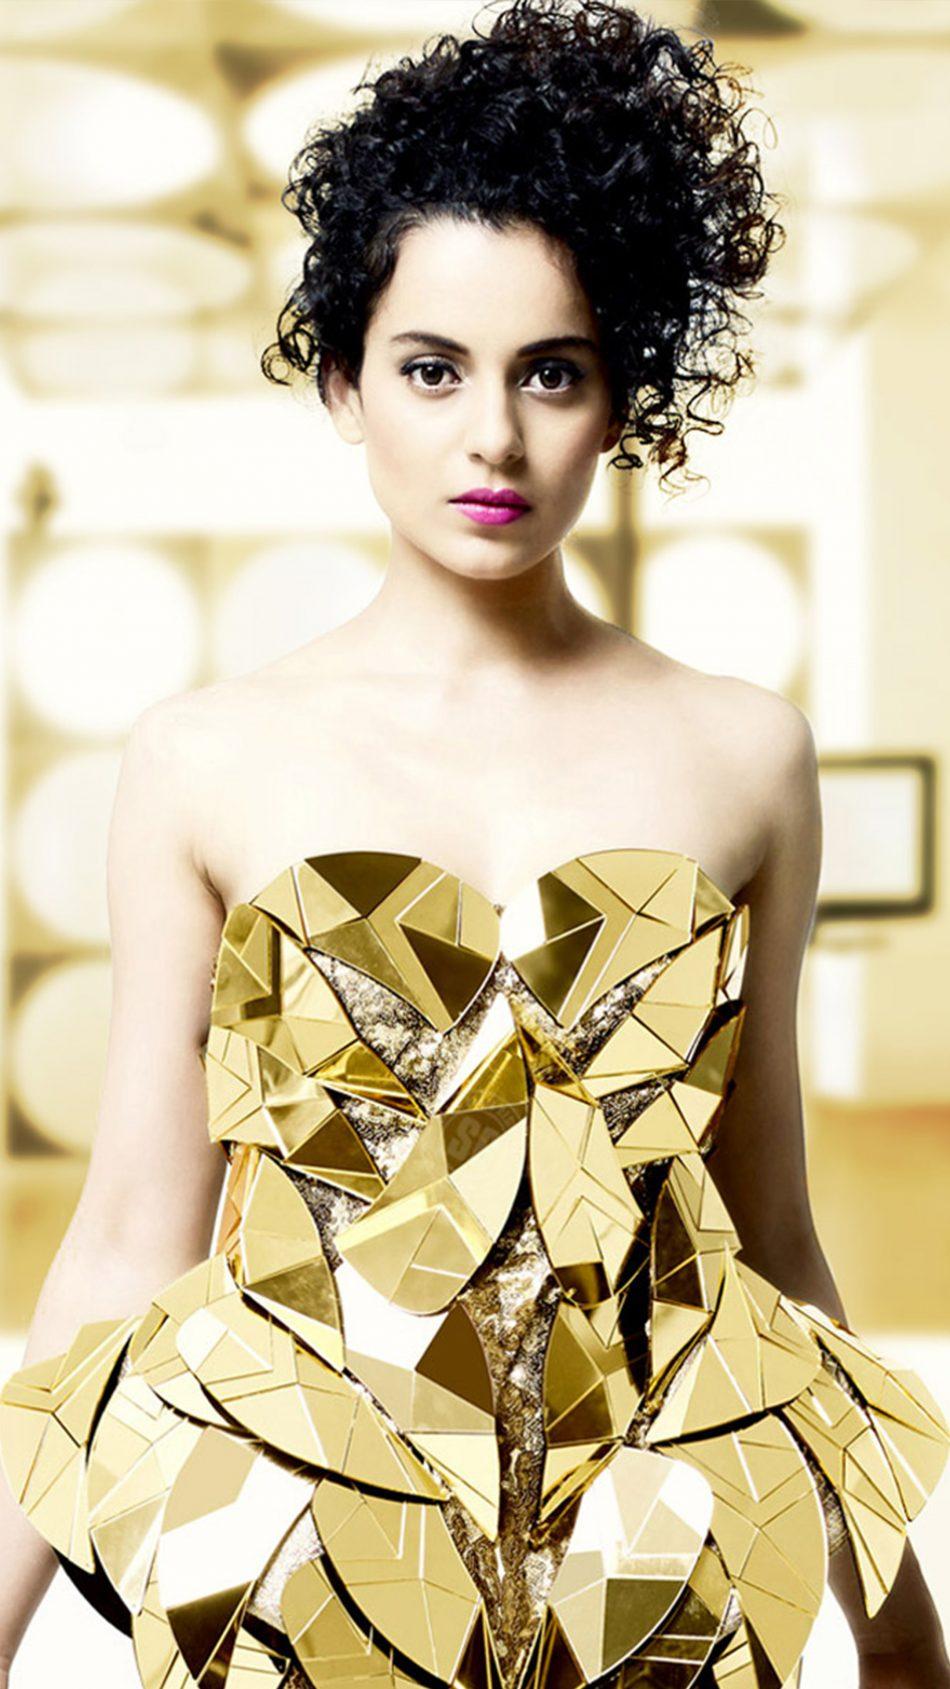 Kangana Ranaut In Golden Metallic Dress 4K Ultra HD Mobile Wallpaper